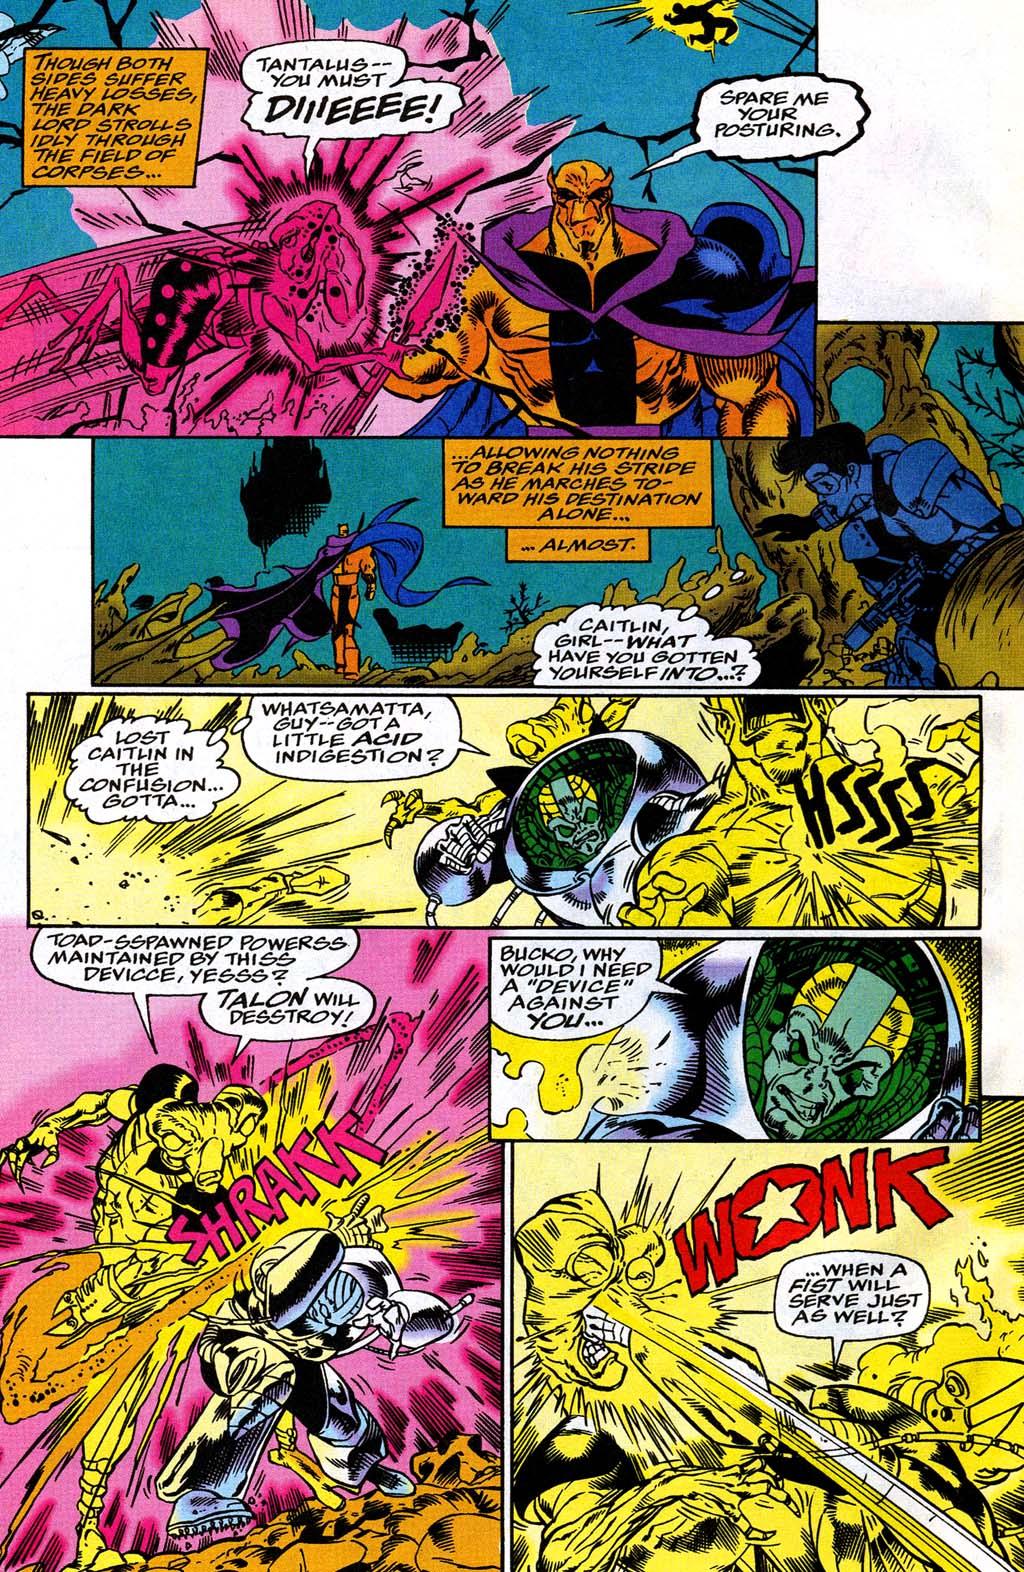 Read online Blackwulf comic -  Issue #8 - 16